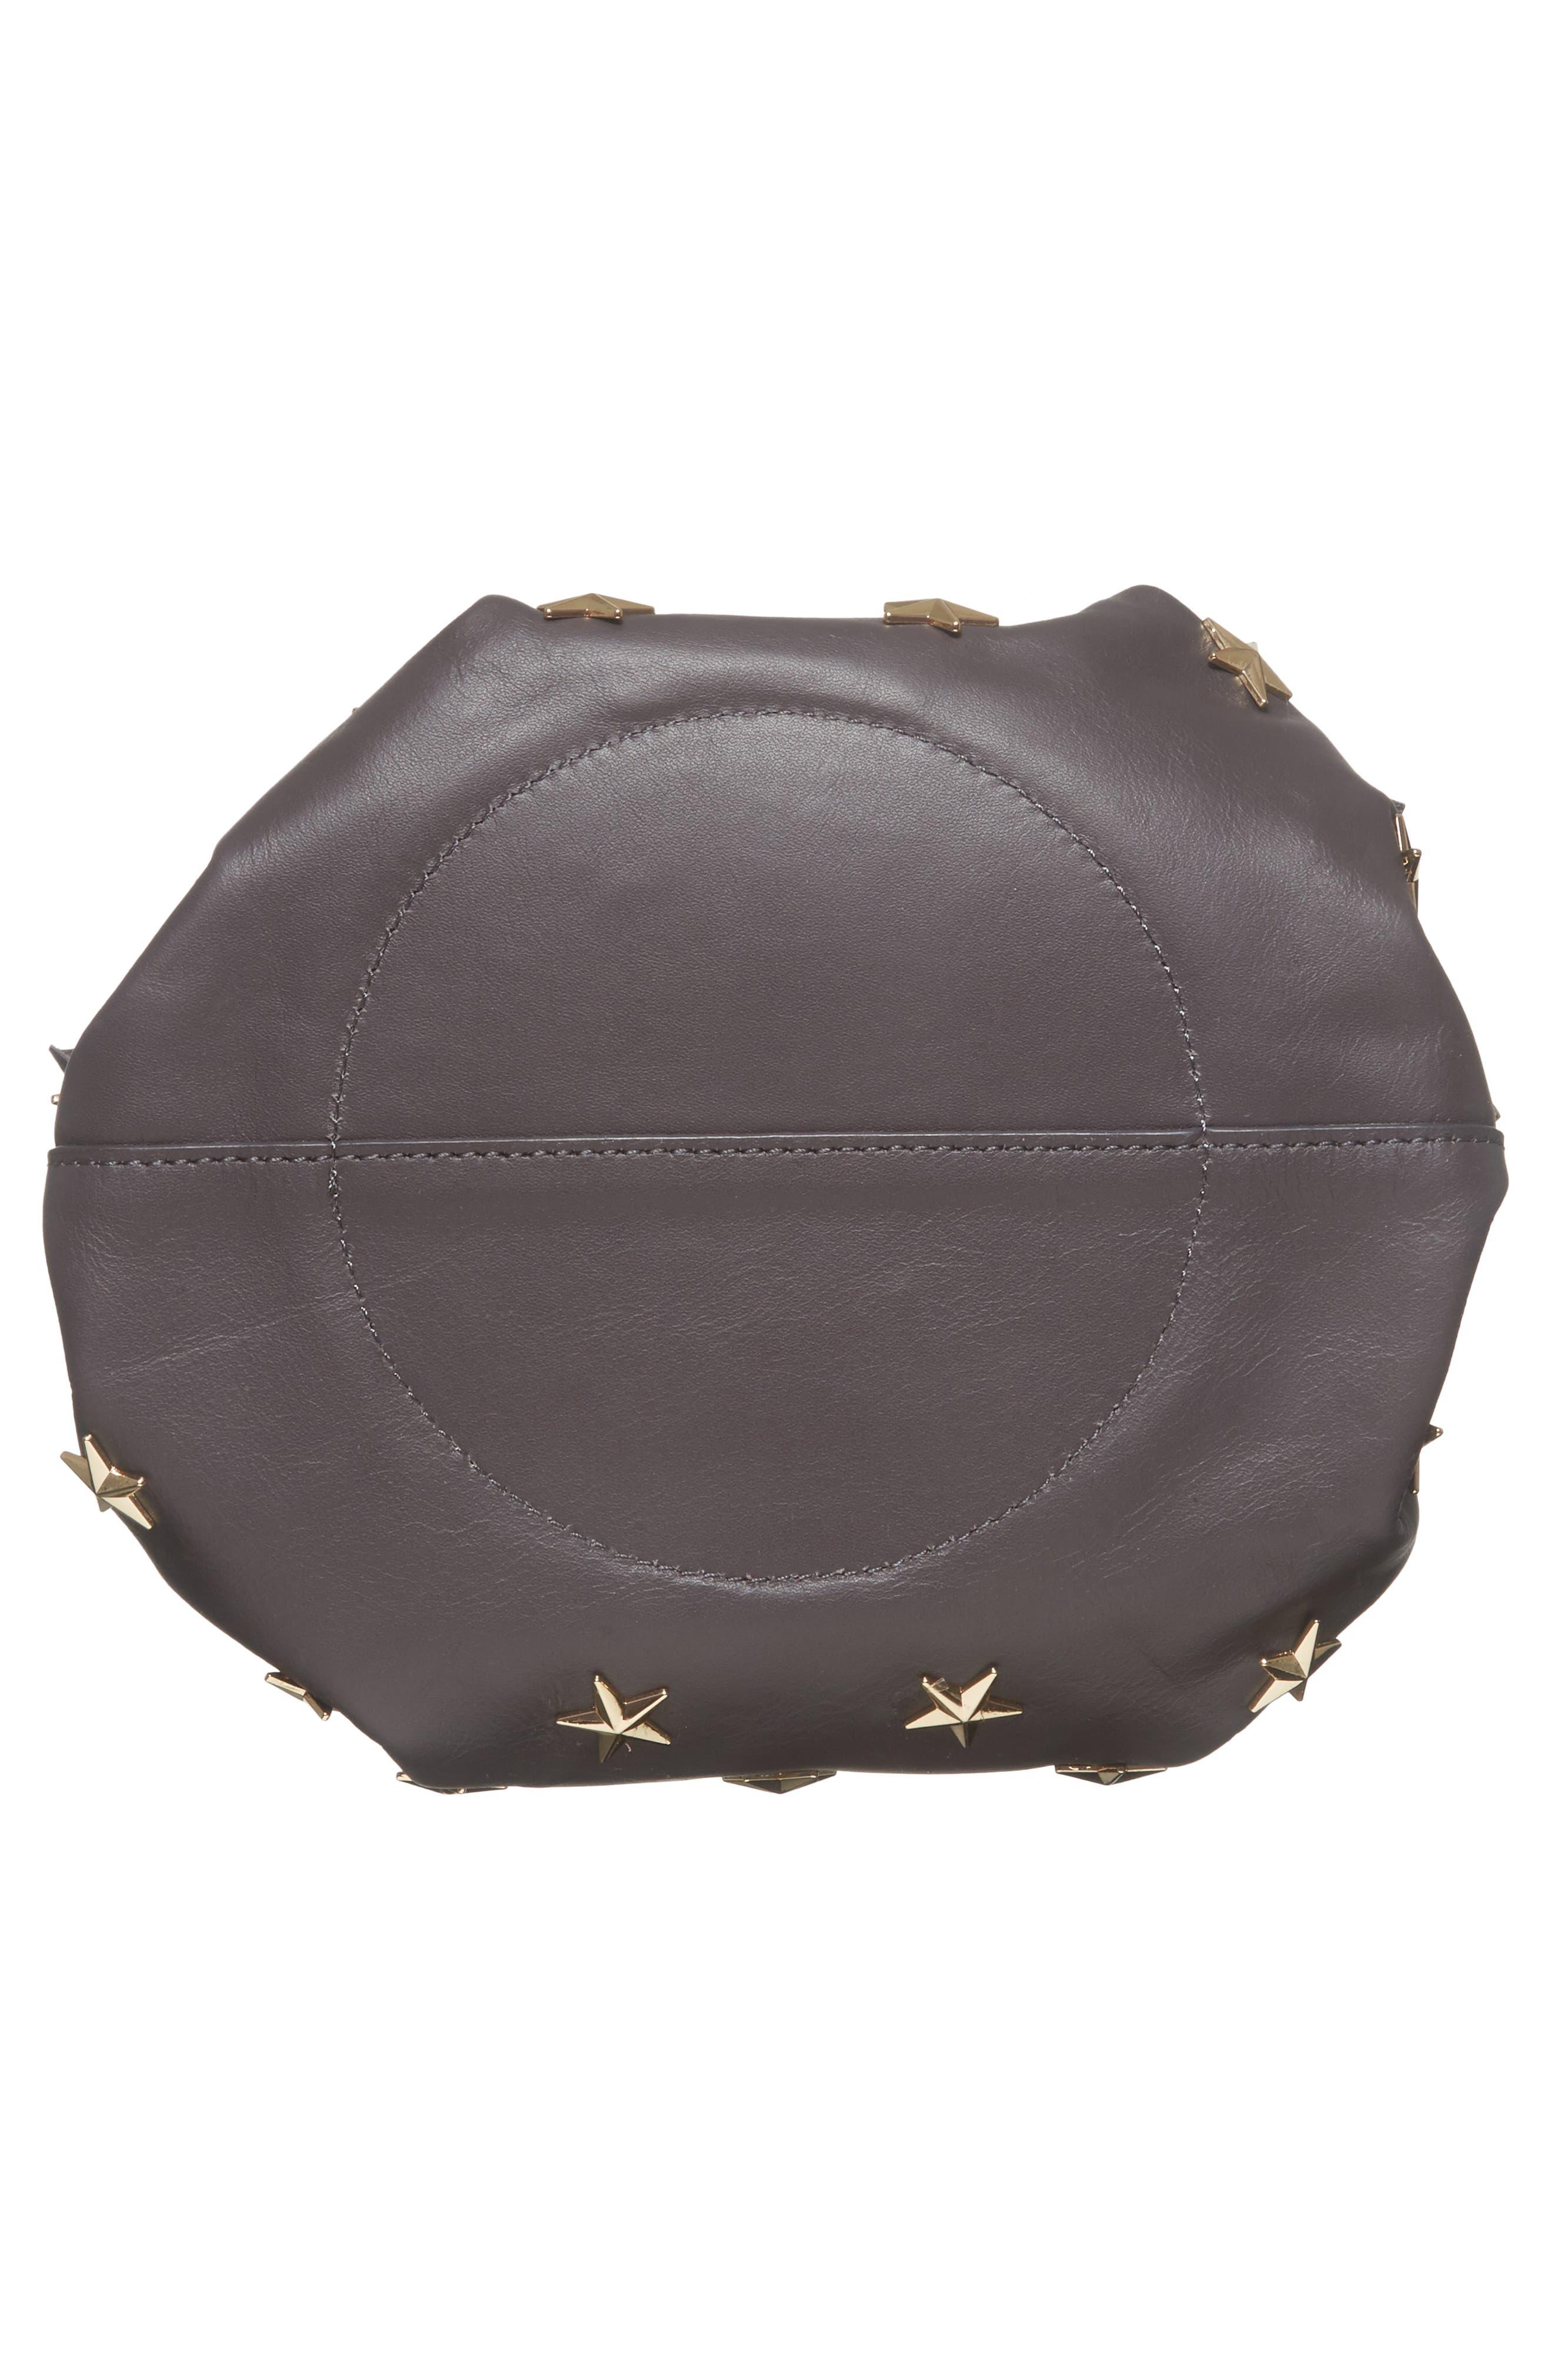 Soirée Star Stud Leather Crossbody Bag,                             Alternate thumbnail 6, color,                             020